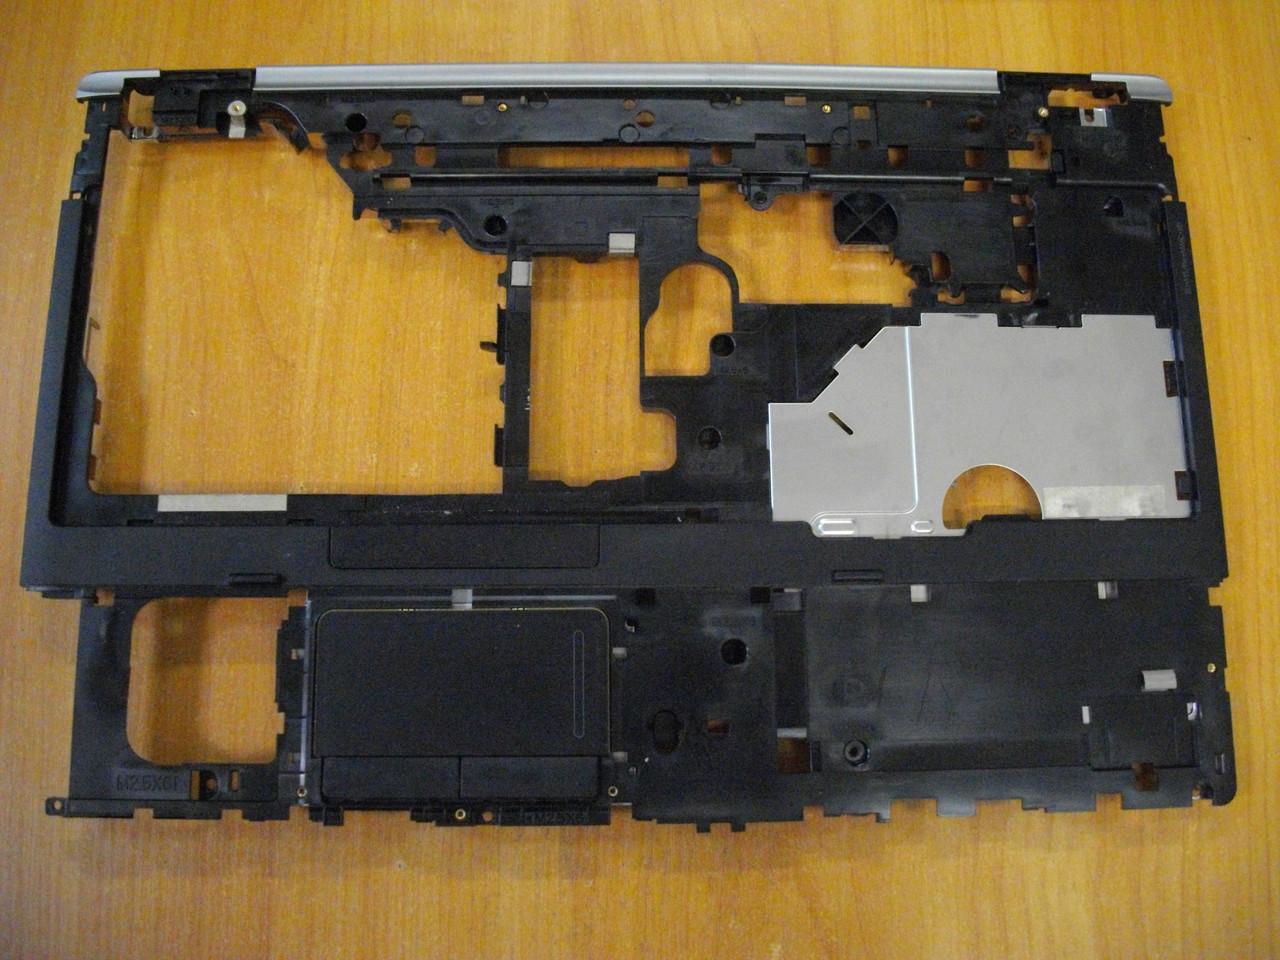 Корпус. Каркас Средняя часть, верхняя часть корпуса с тачпадом HP ProBook 6555b